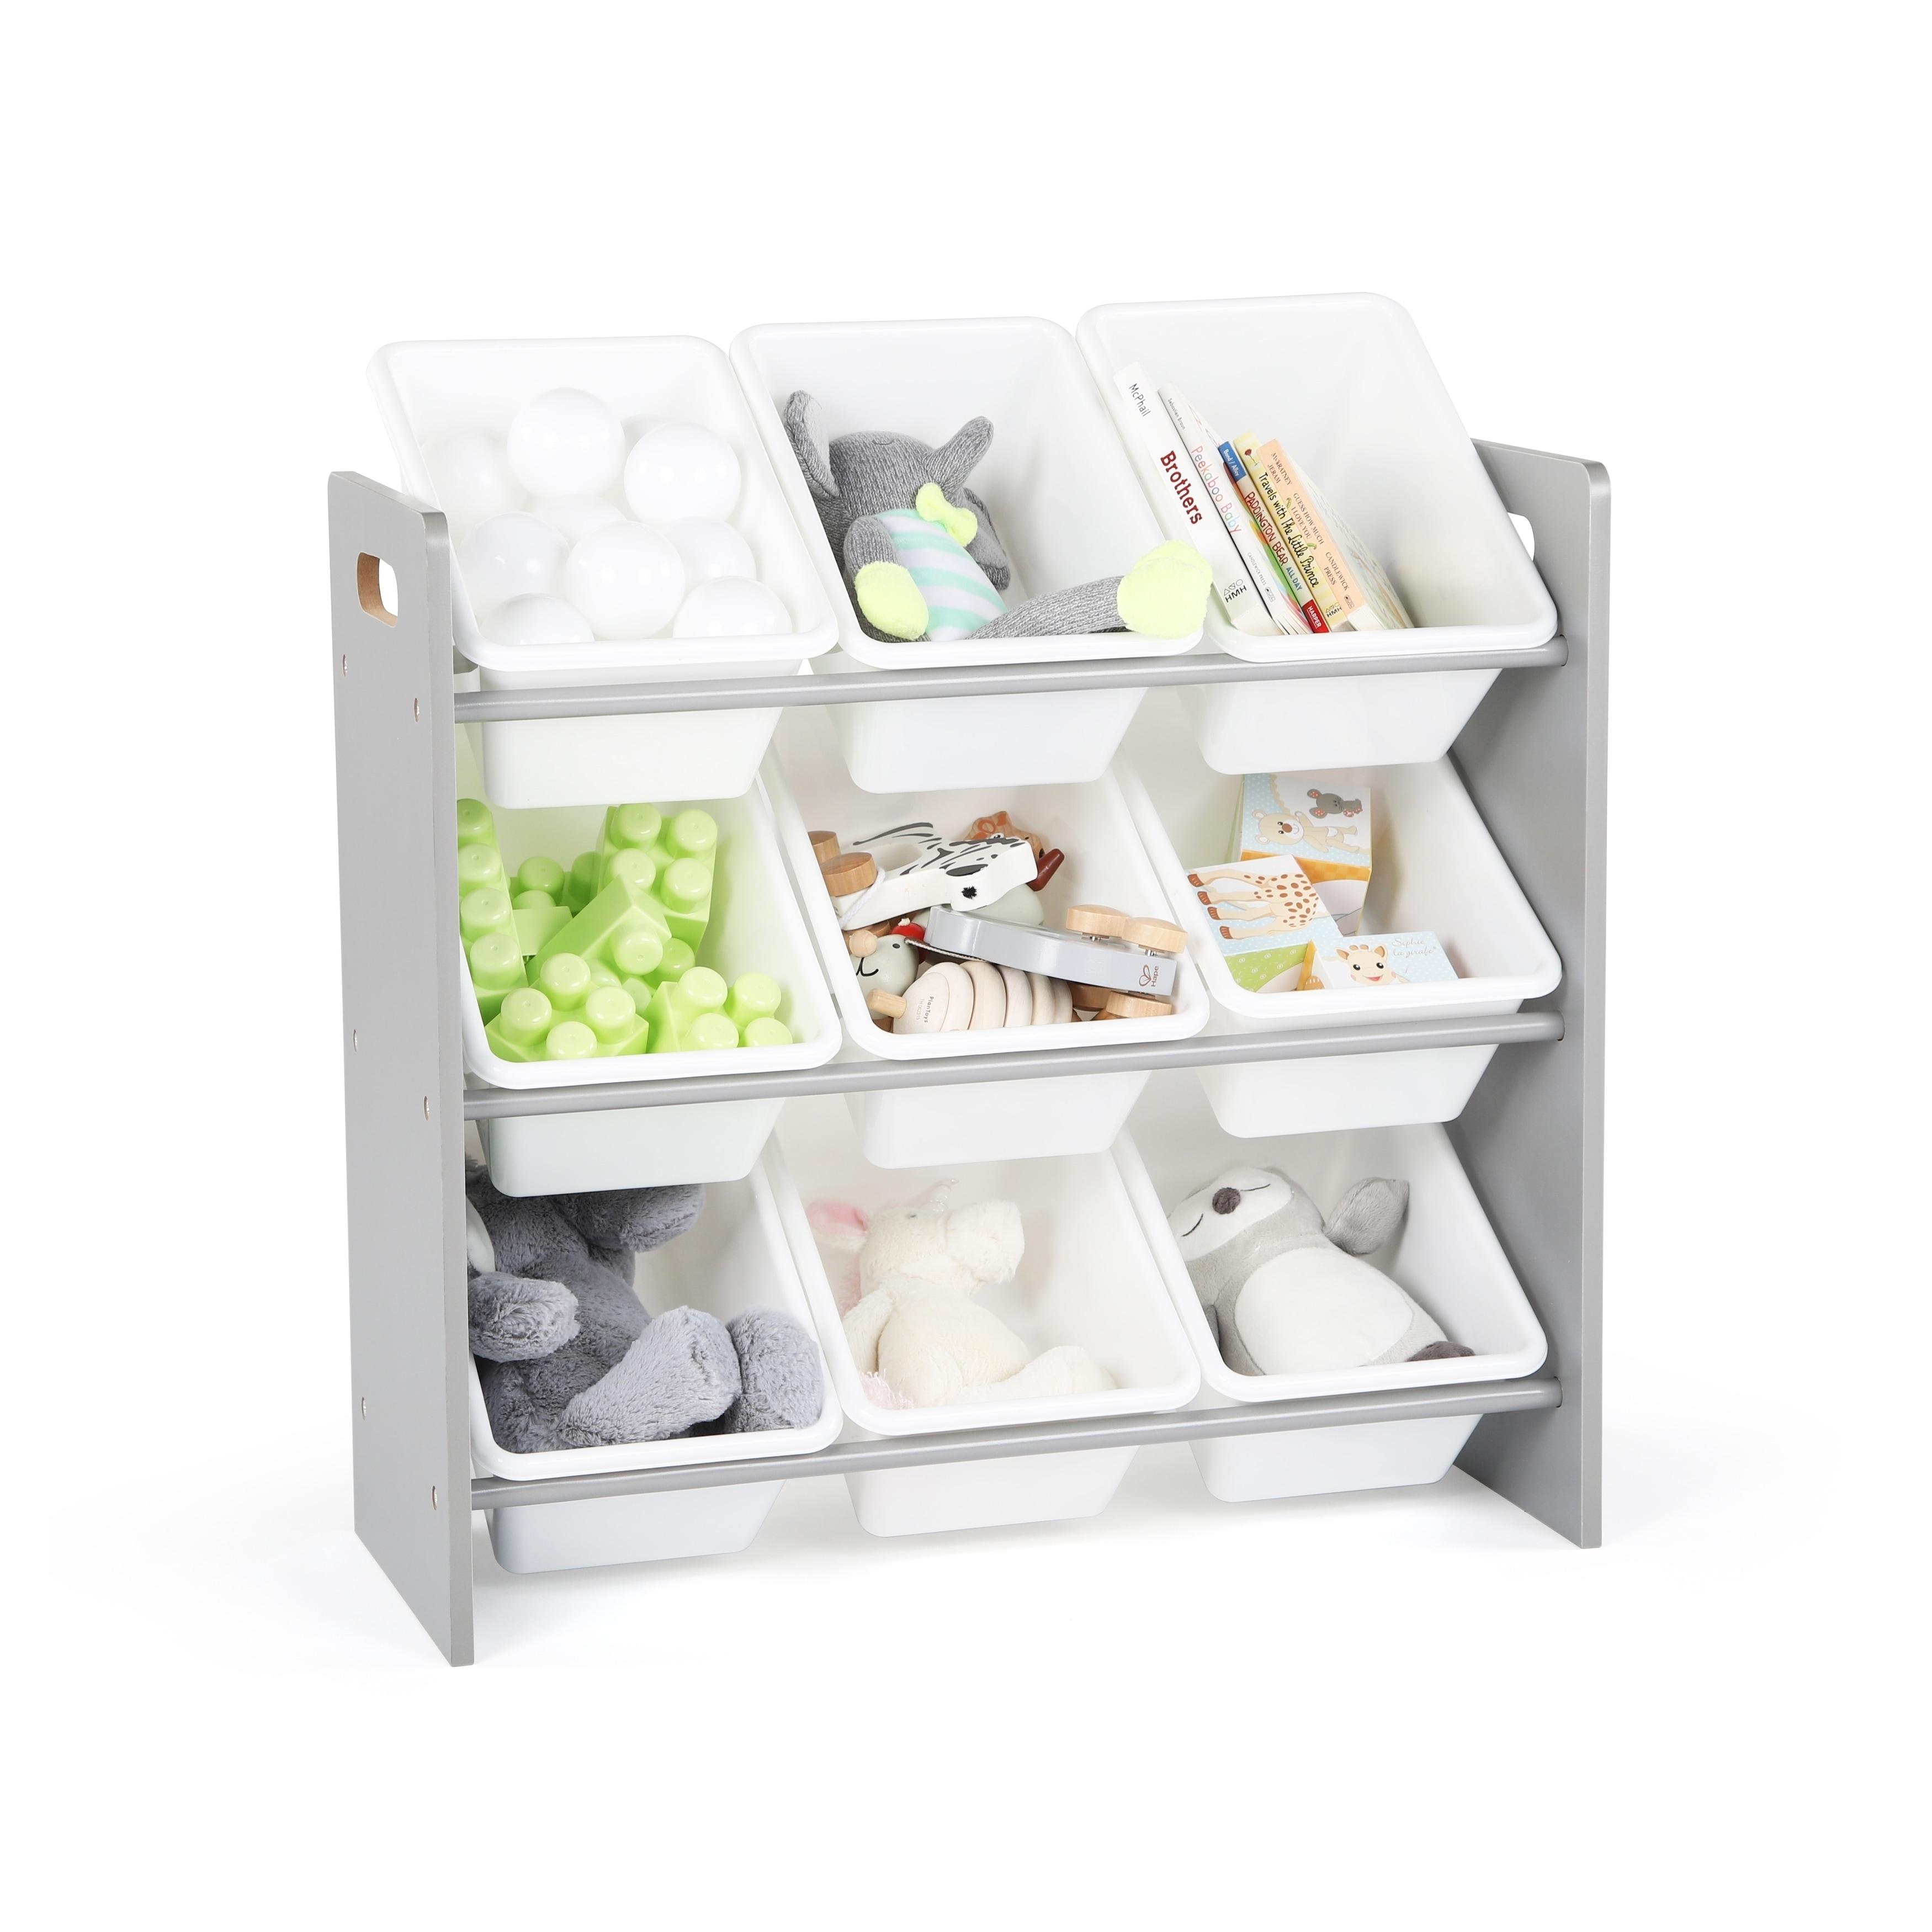 Tot Tutors Grey White Kids Toy Storage Organizer W 9 Plastic Bins Inspire Collection